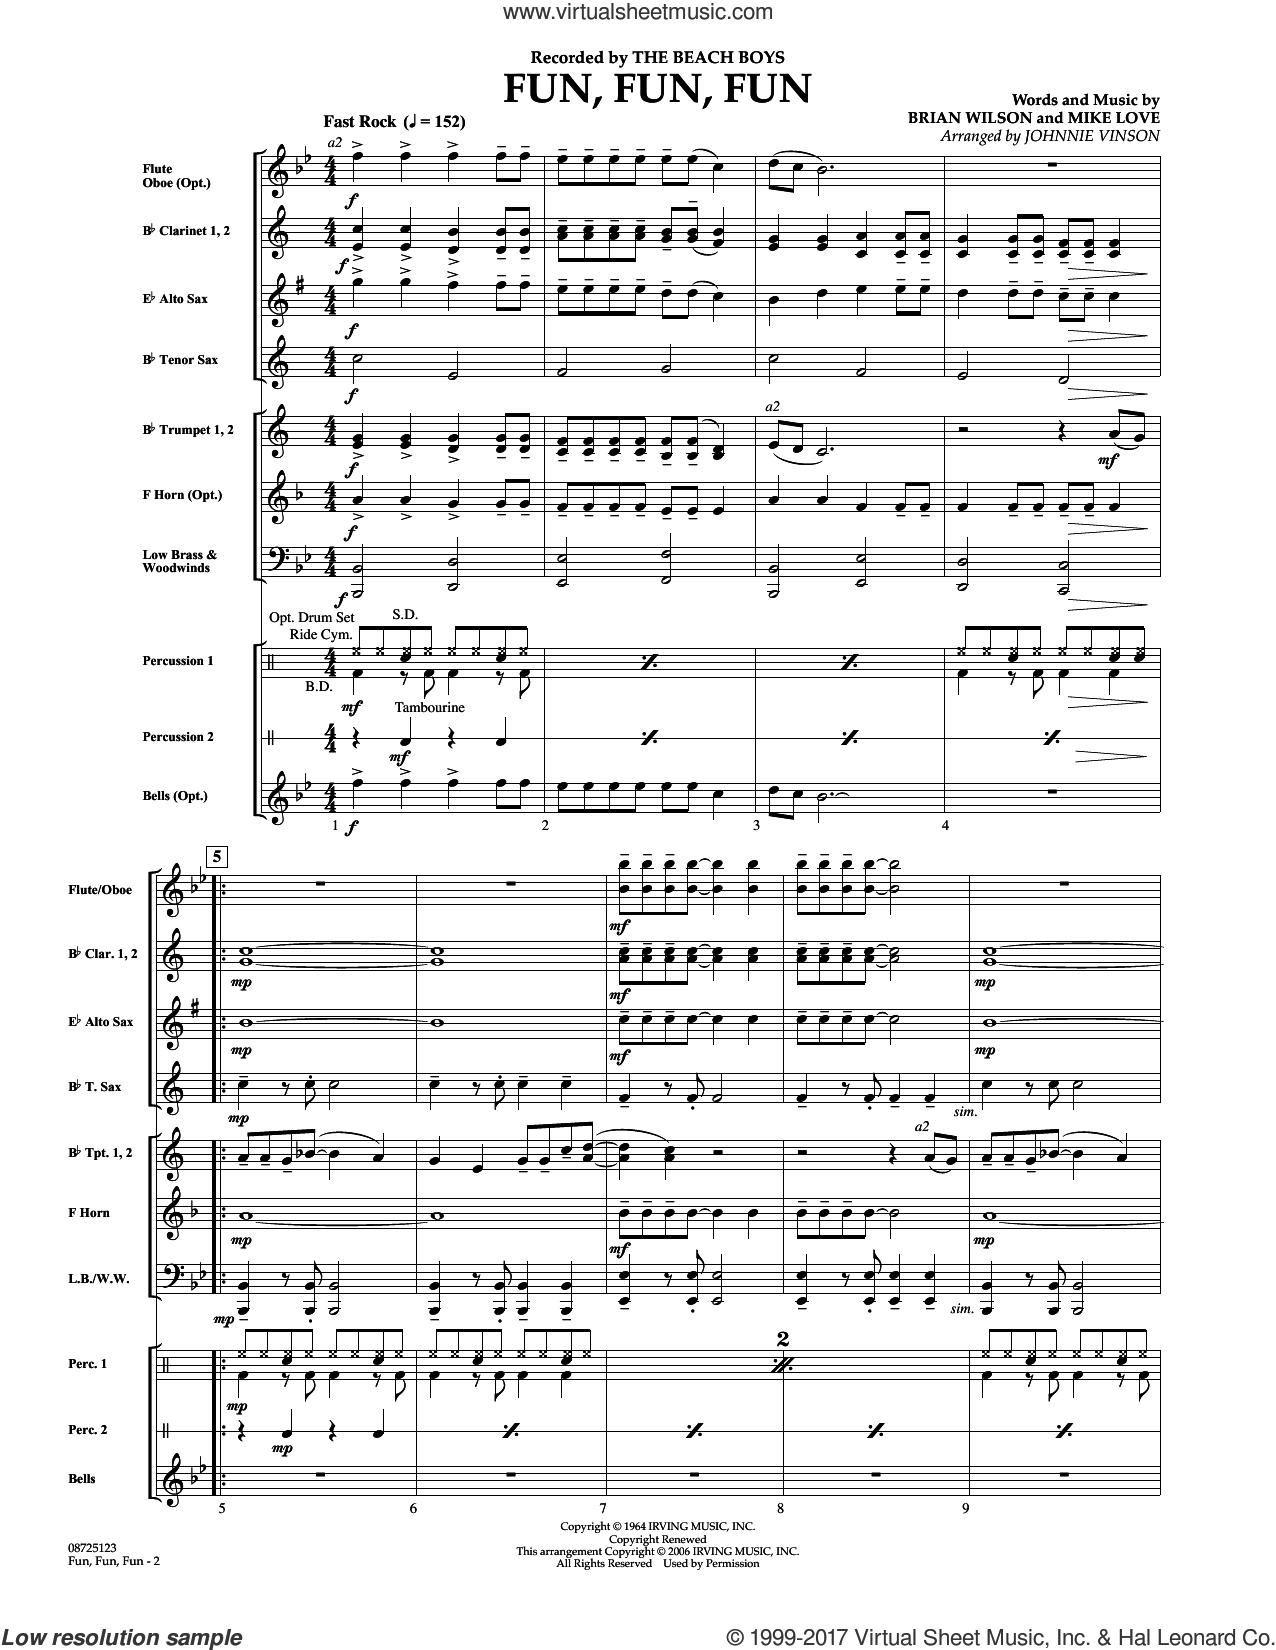 Fun, Fun, Fun (COMPLETE) sheet music for concert band by The Beach Boys, Brian Wilson, Johnnie Vinson and Mike Love, intermediate skill level